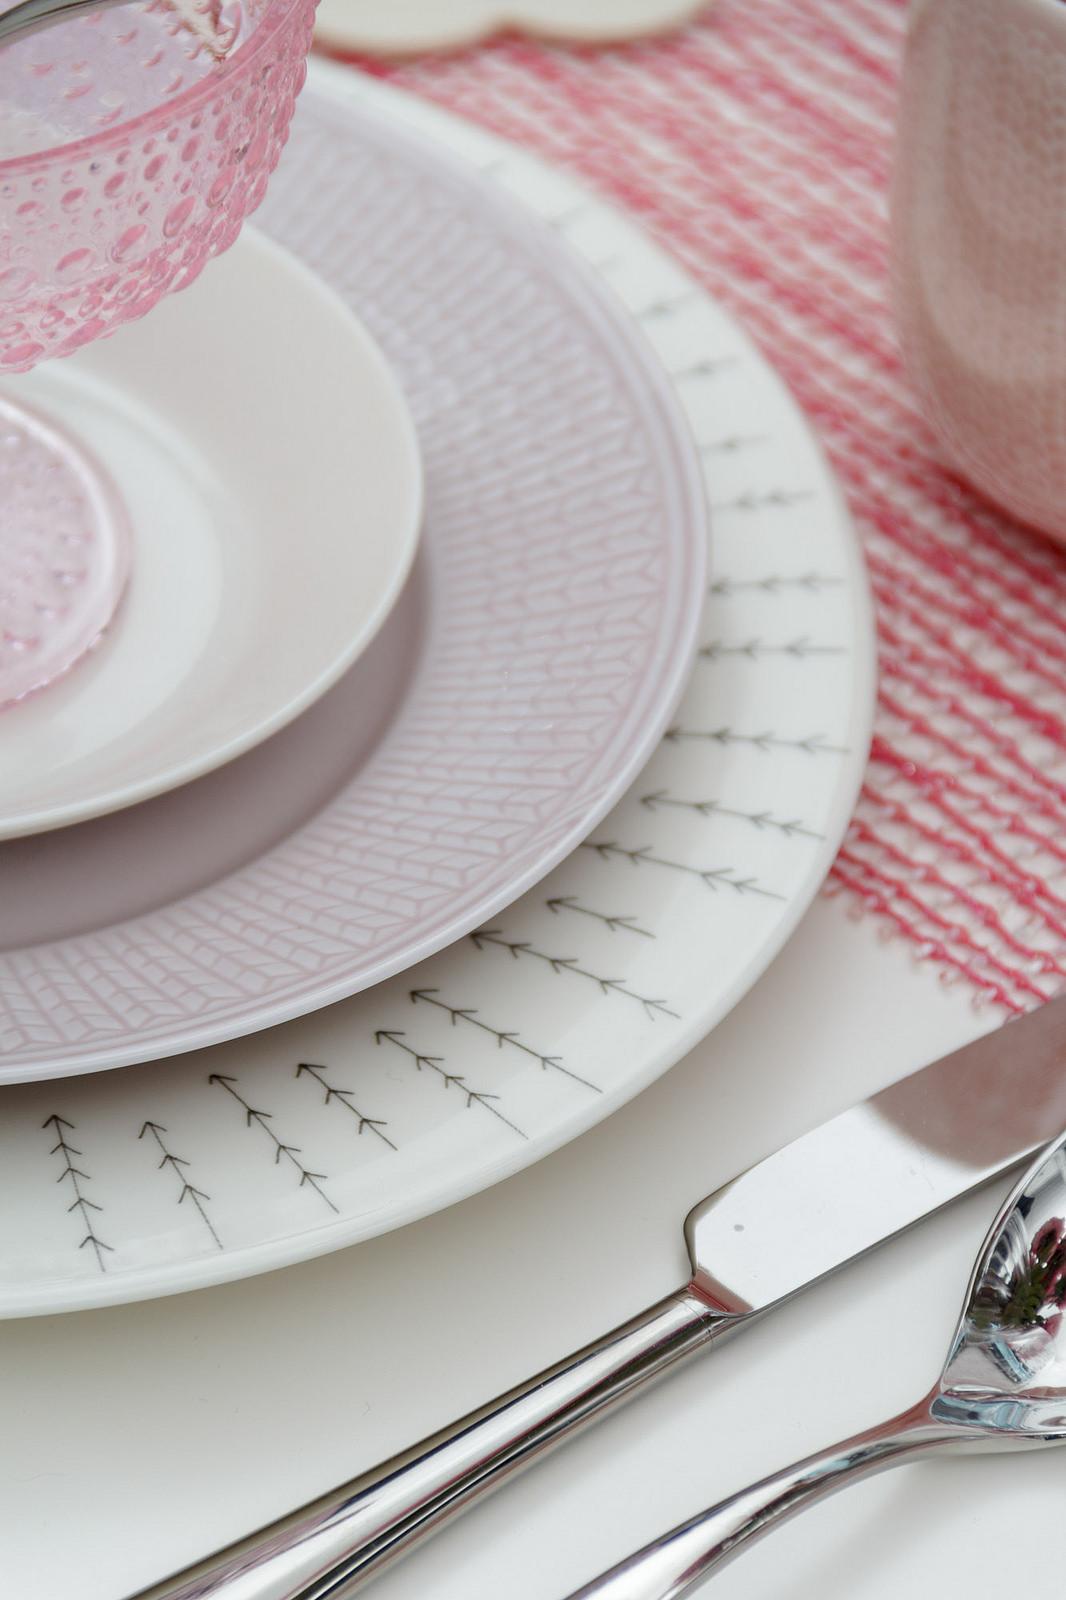 iittala Sarjaton and Rorstrand Swedish Grace dinnerware